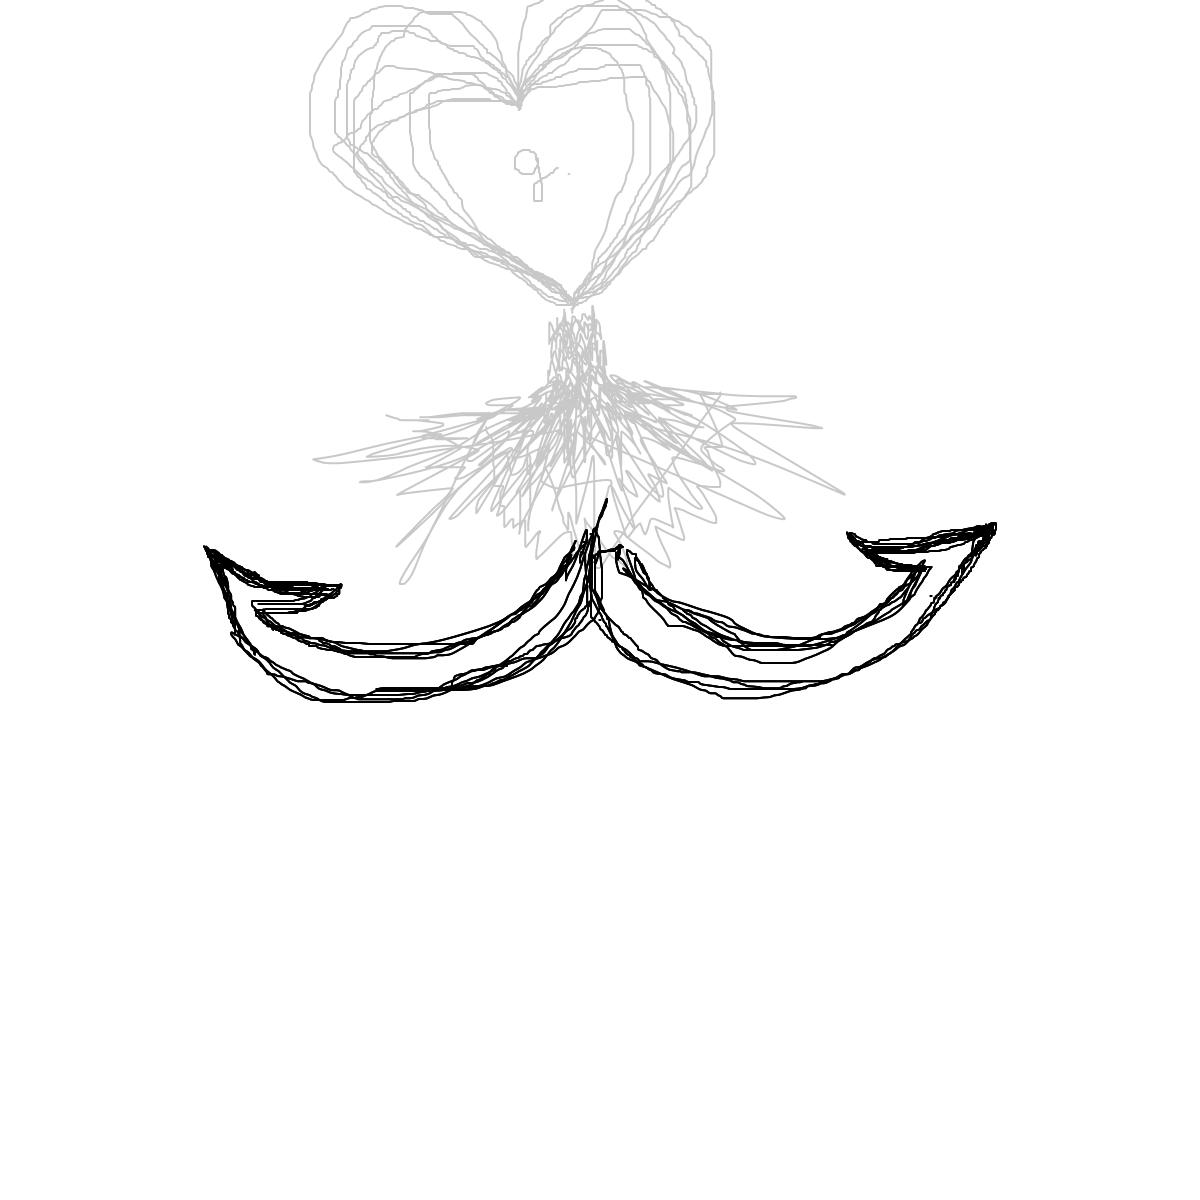 BAAAM drawing#8471 lat:46.0359916687011700lng: 18.6993637084960940